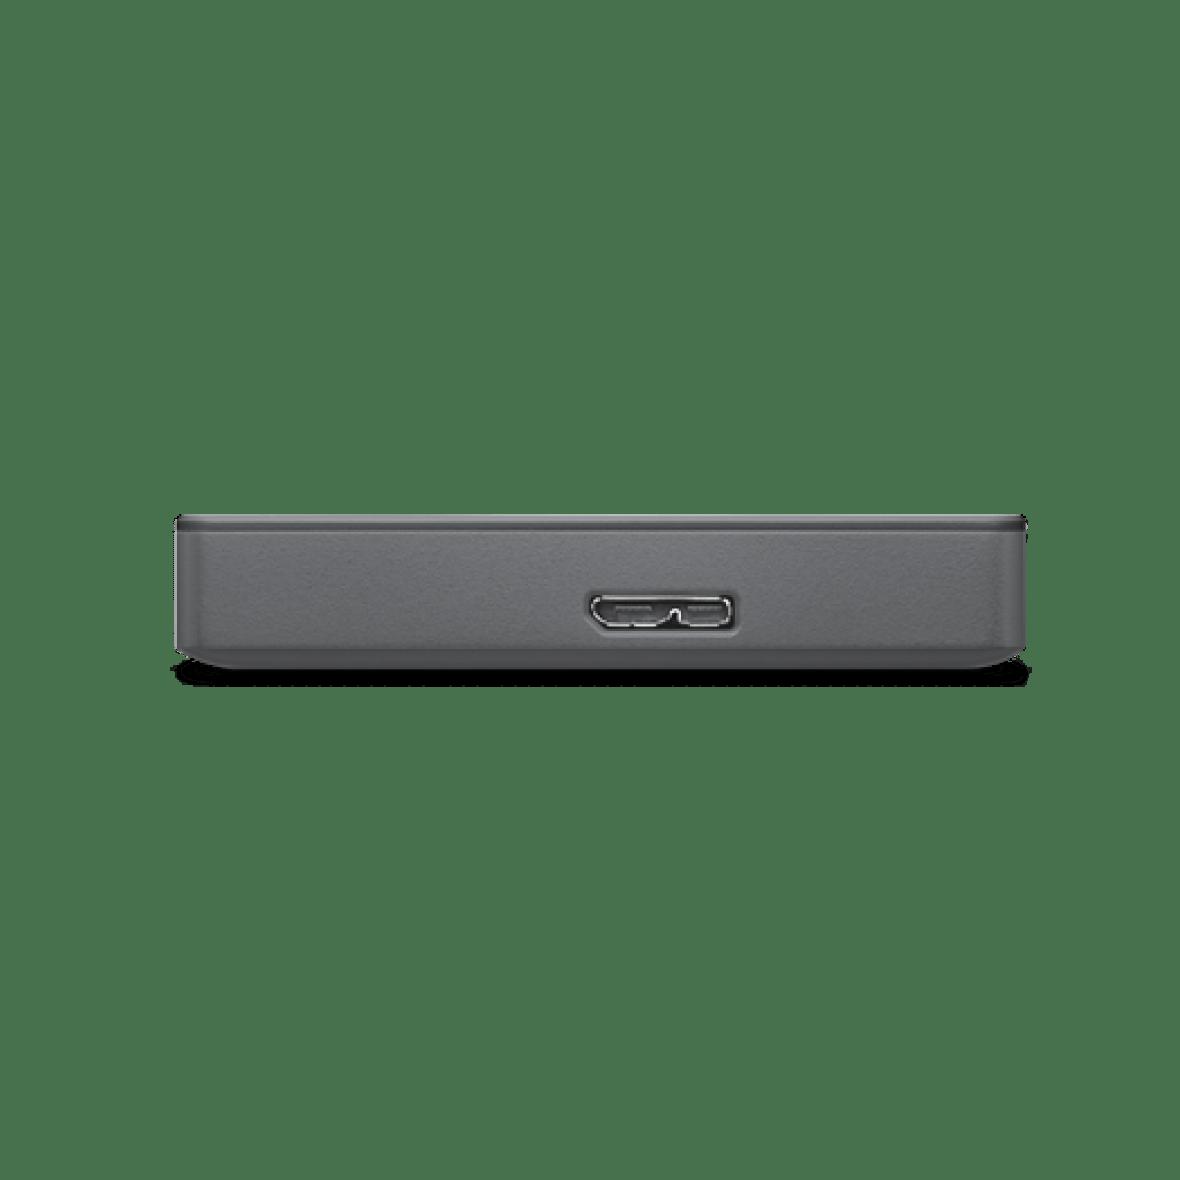 Slider 3 Basic External Hard Drive Product Detail